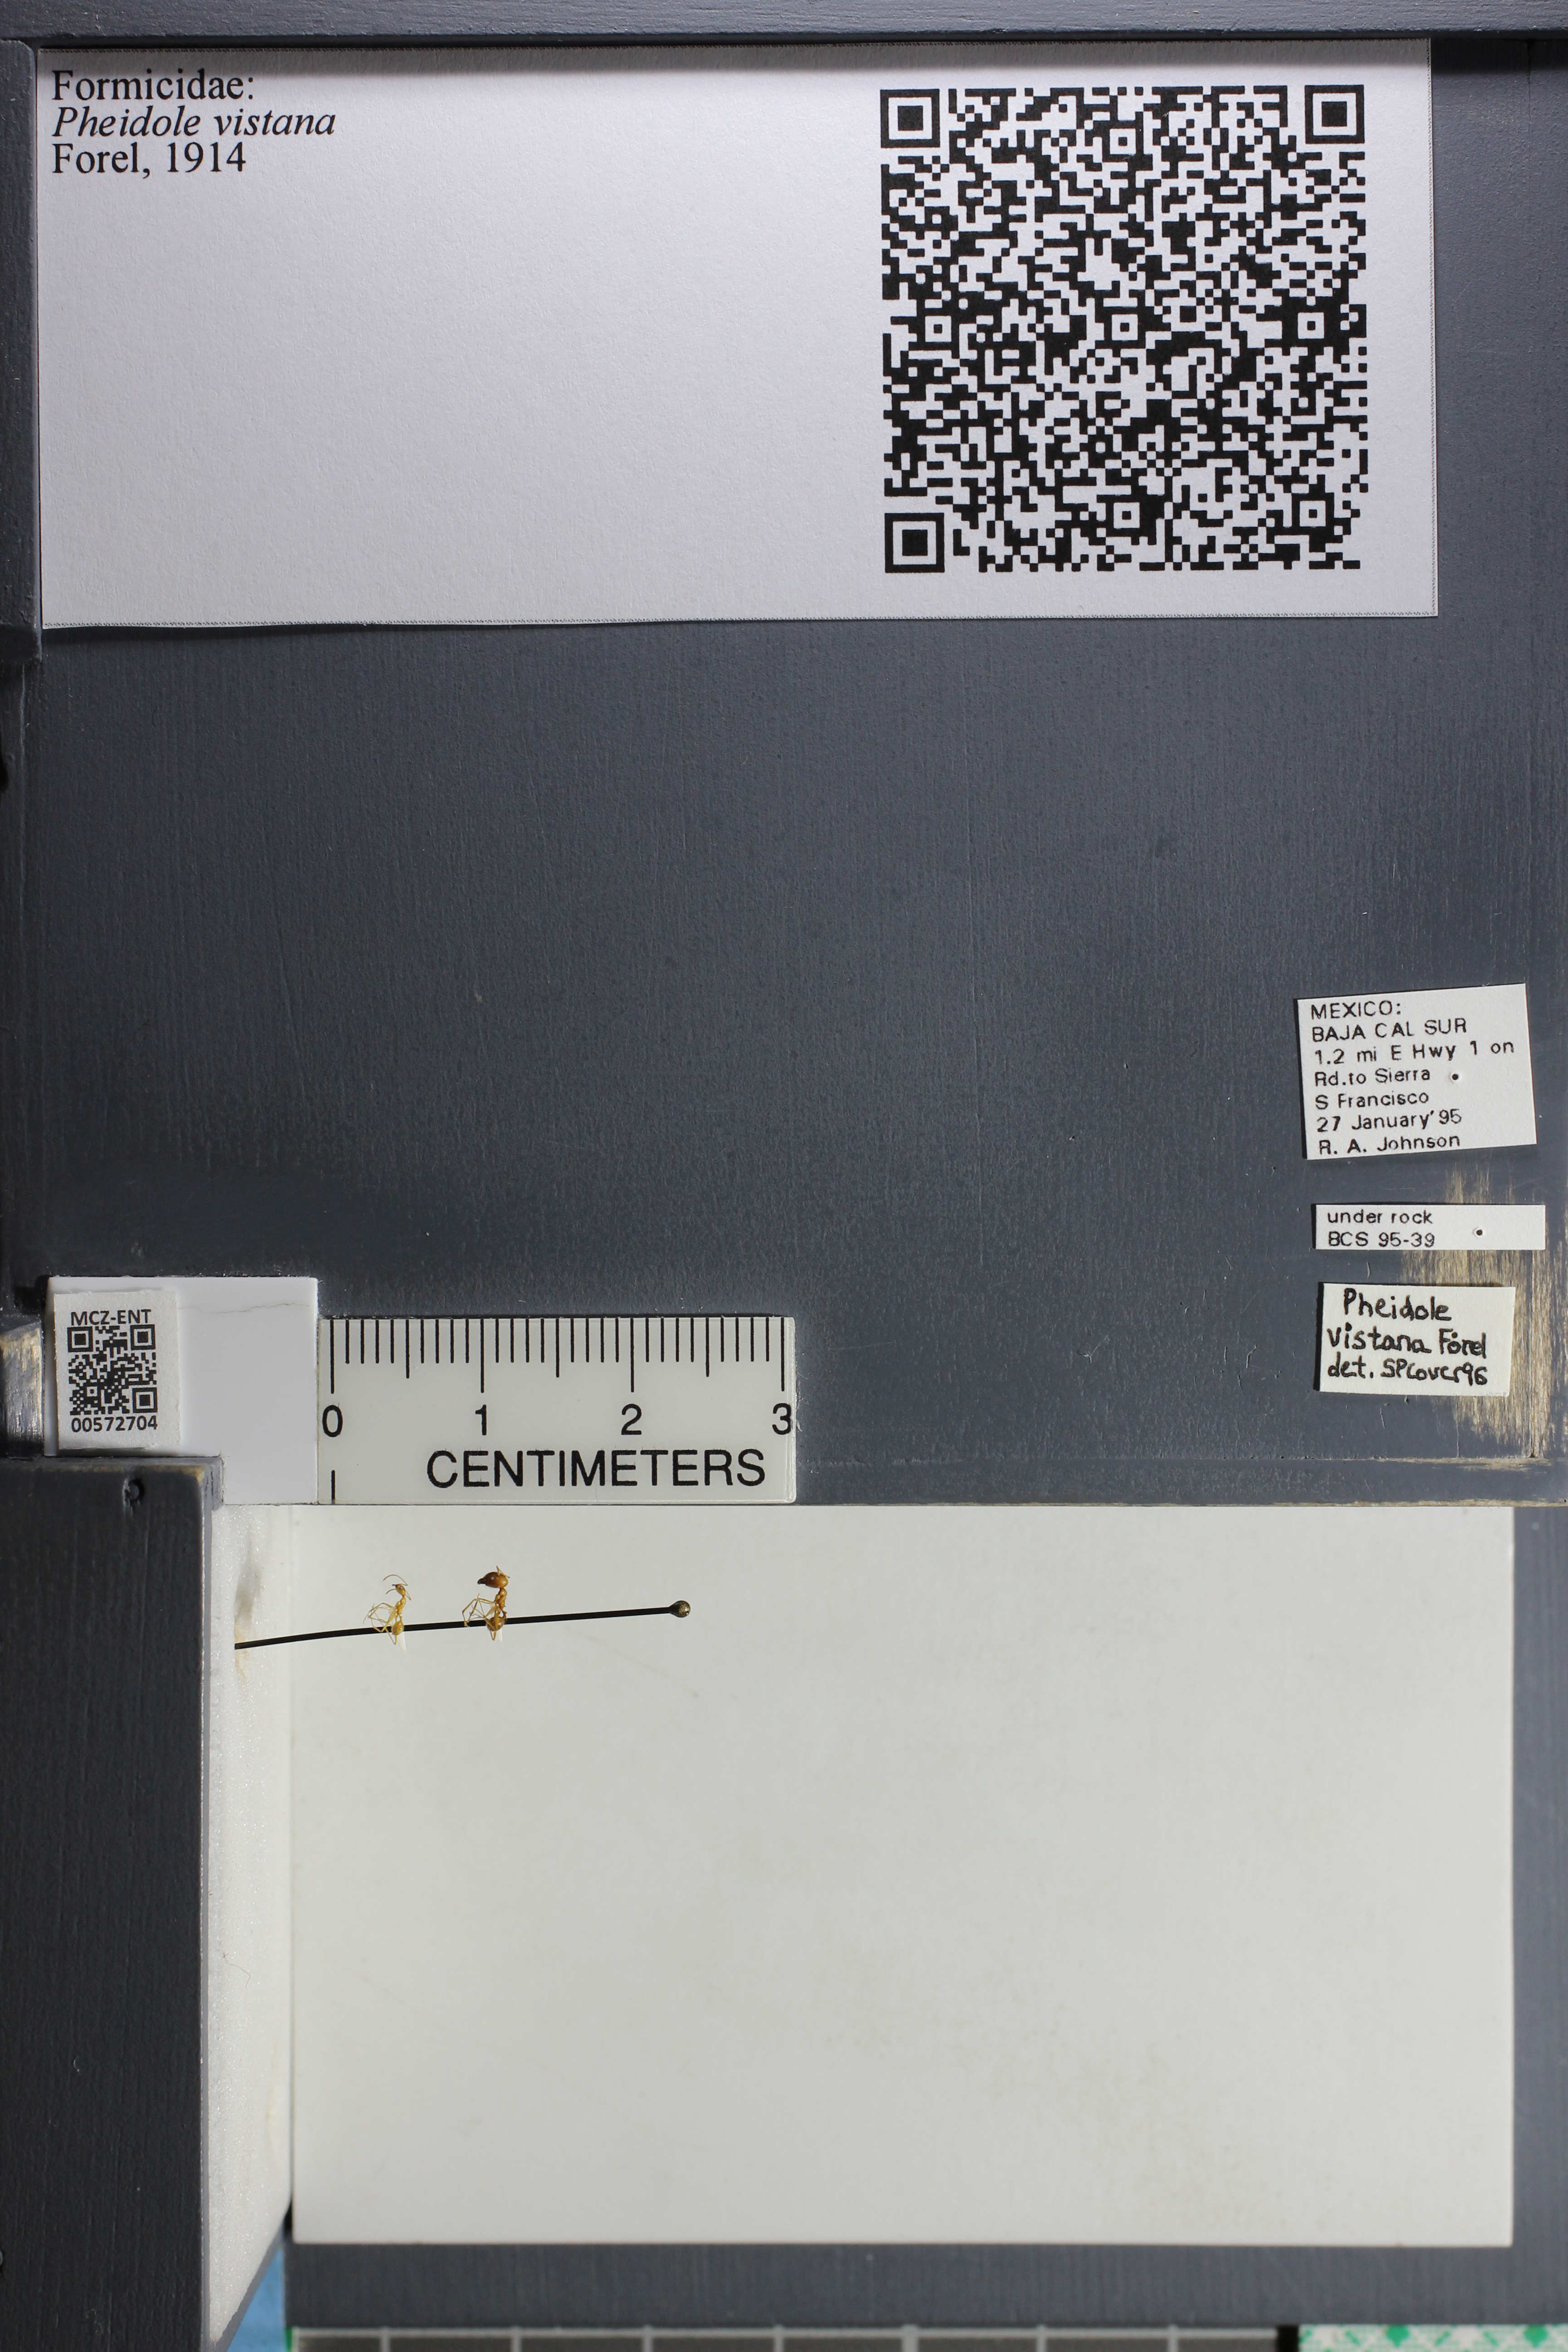 Media of type image, MCZ:Ent:572704 Identified as Pheidole vistana.